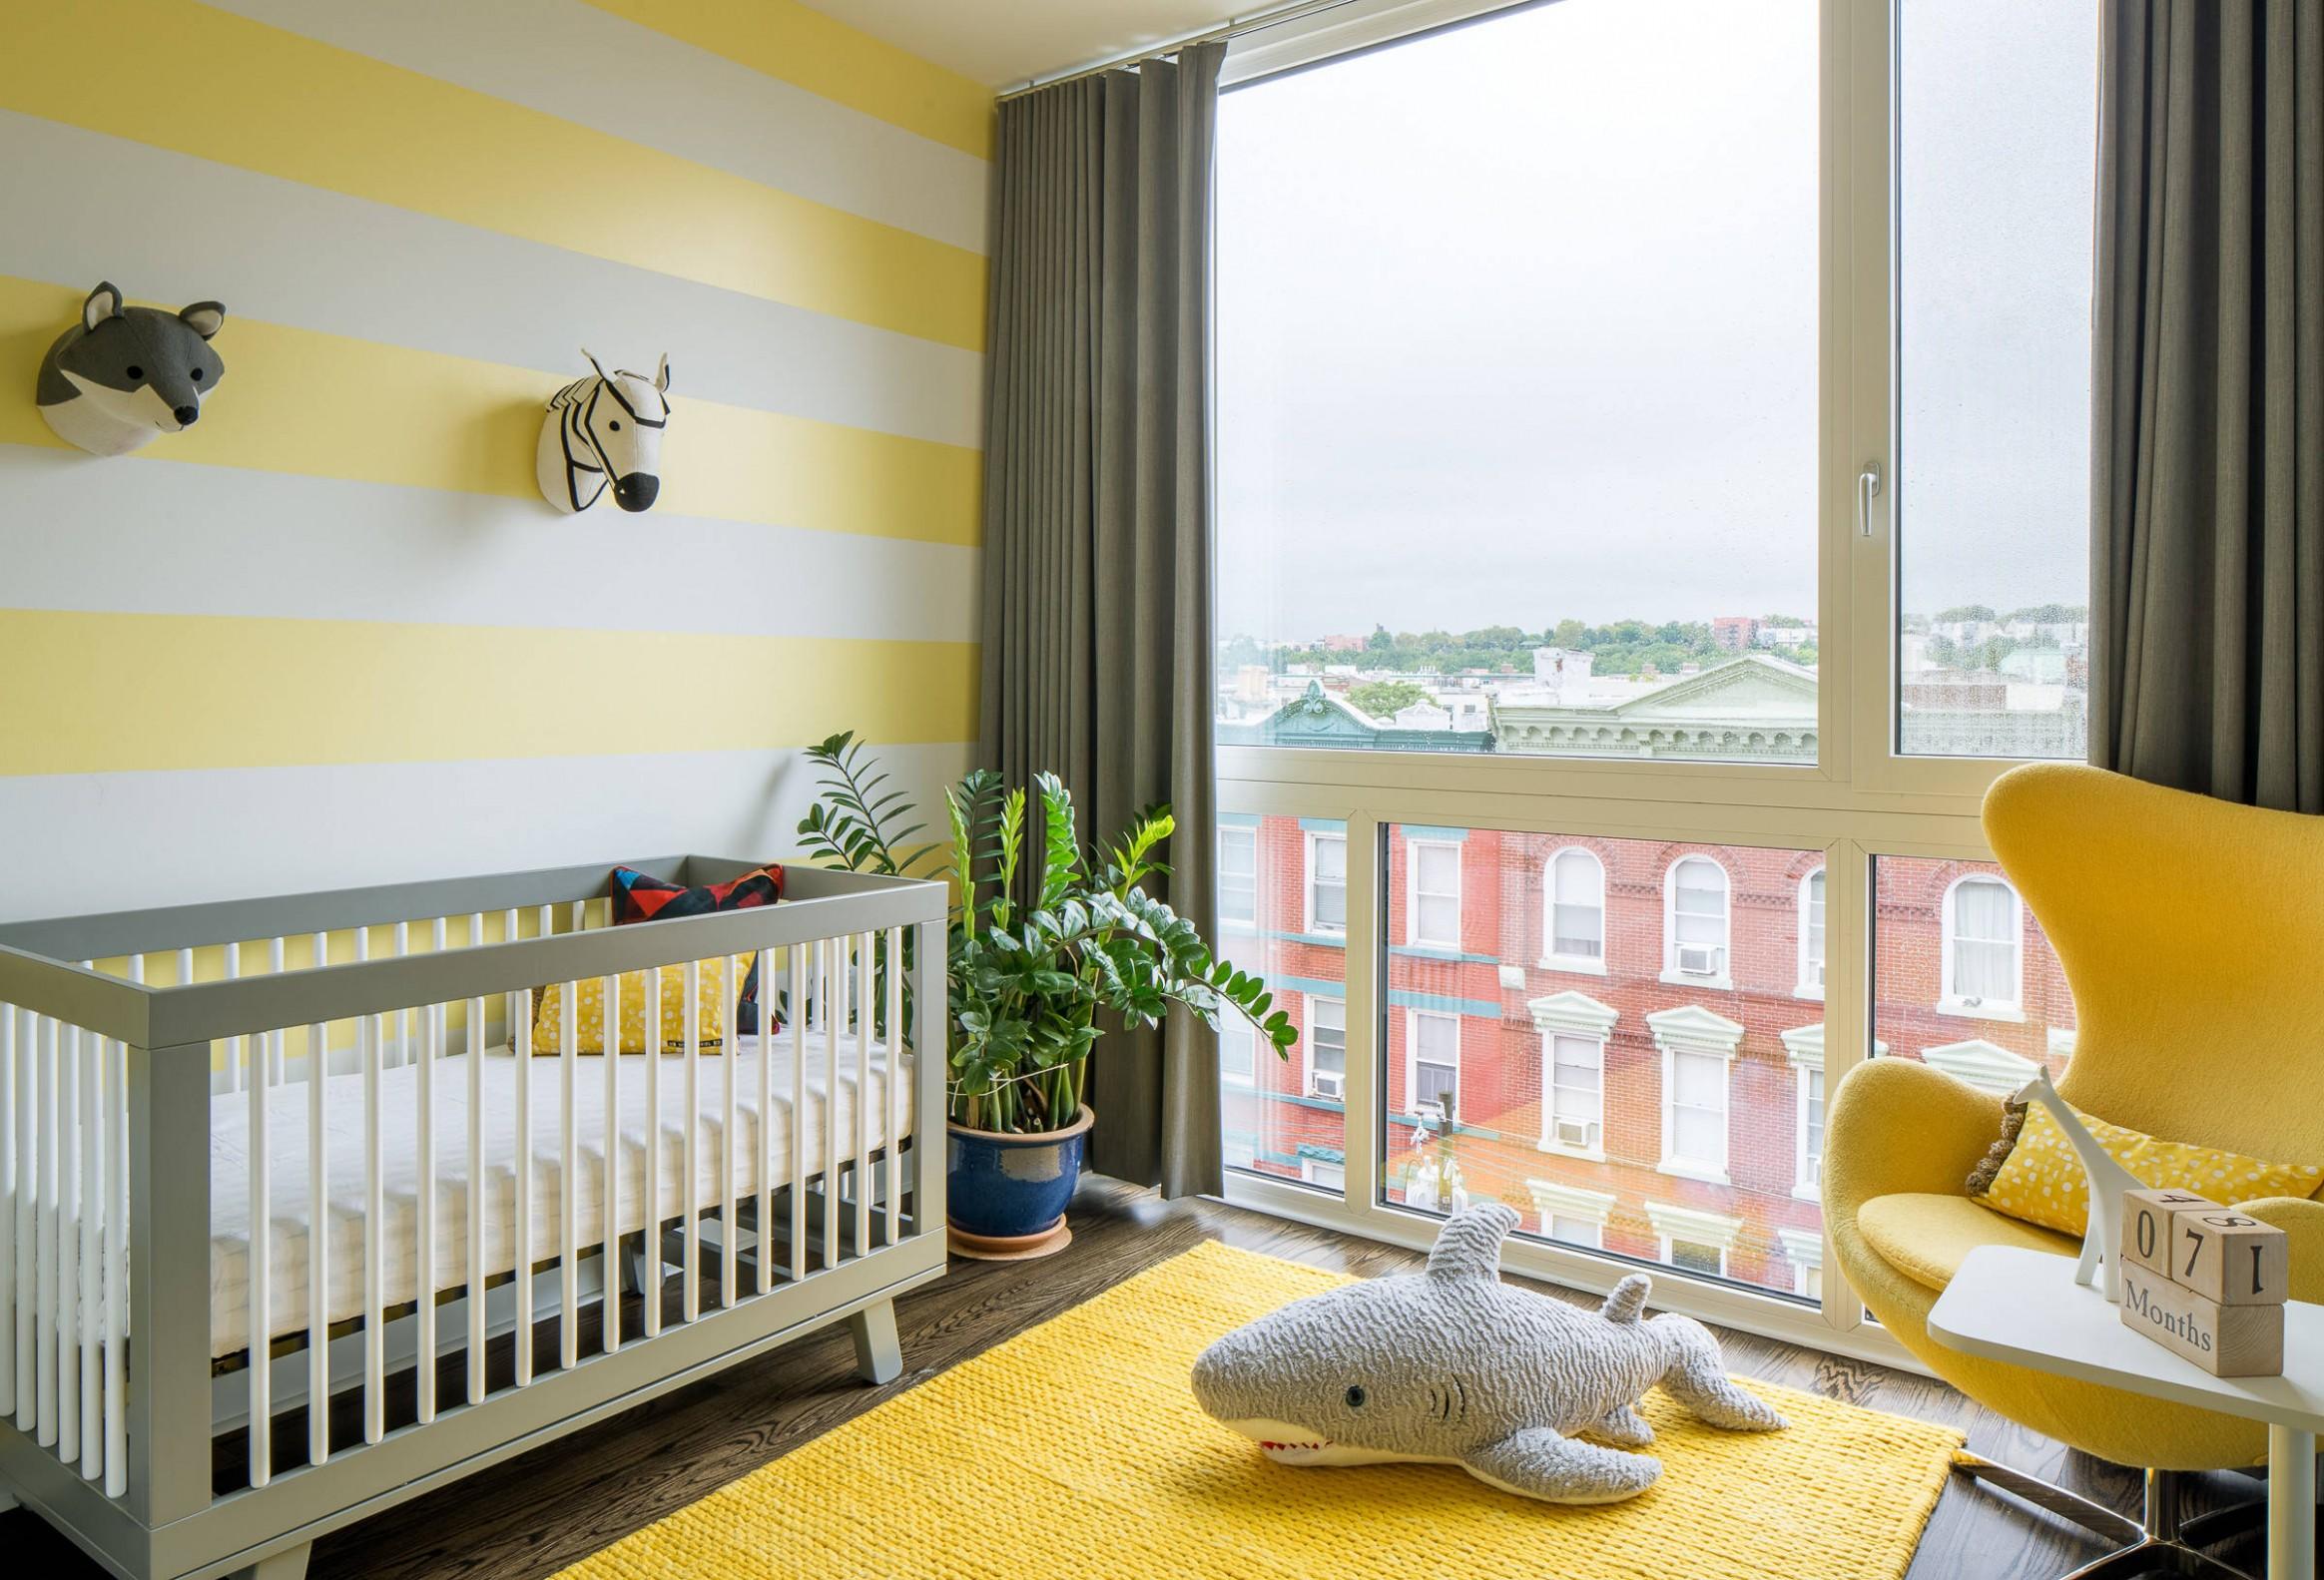 9 Beautiful Yellow Nursery Pictures & Ideas - November, 9  Houzz - Baby Room Yellow